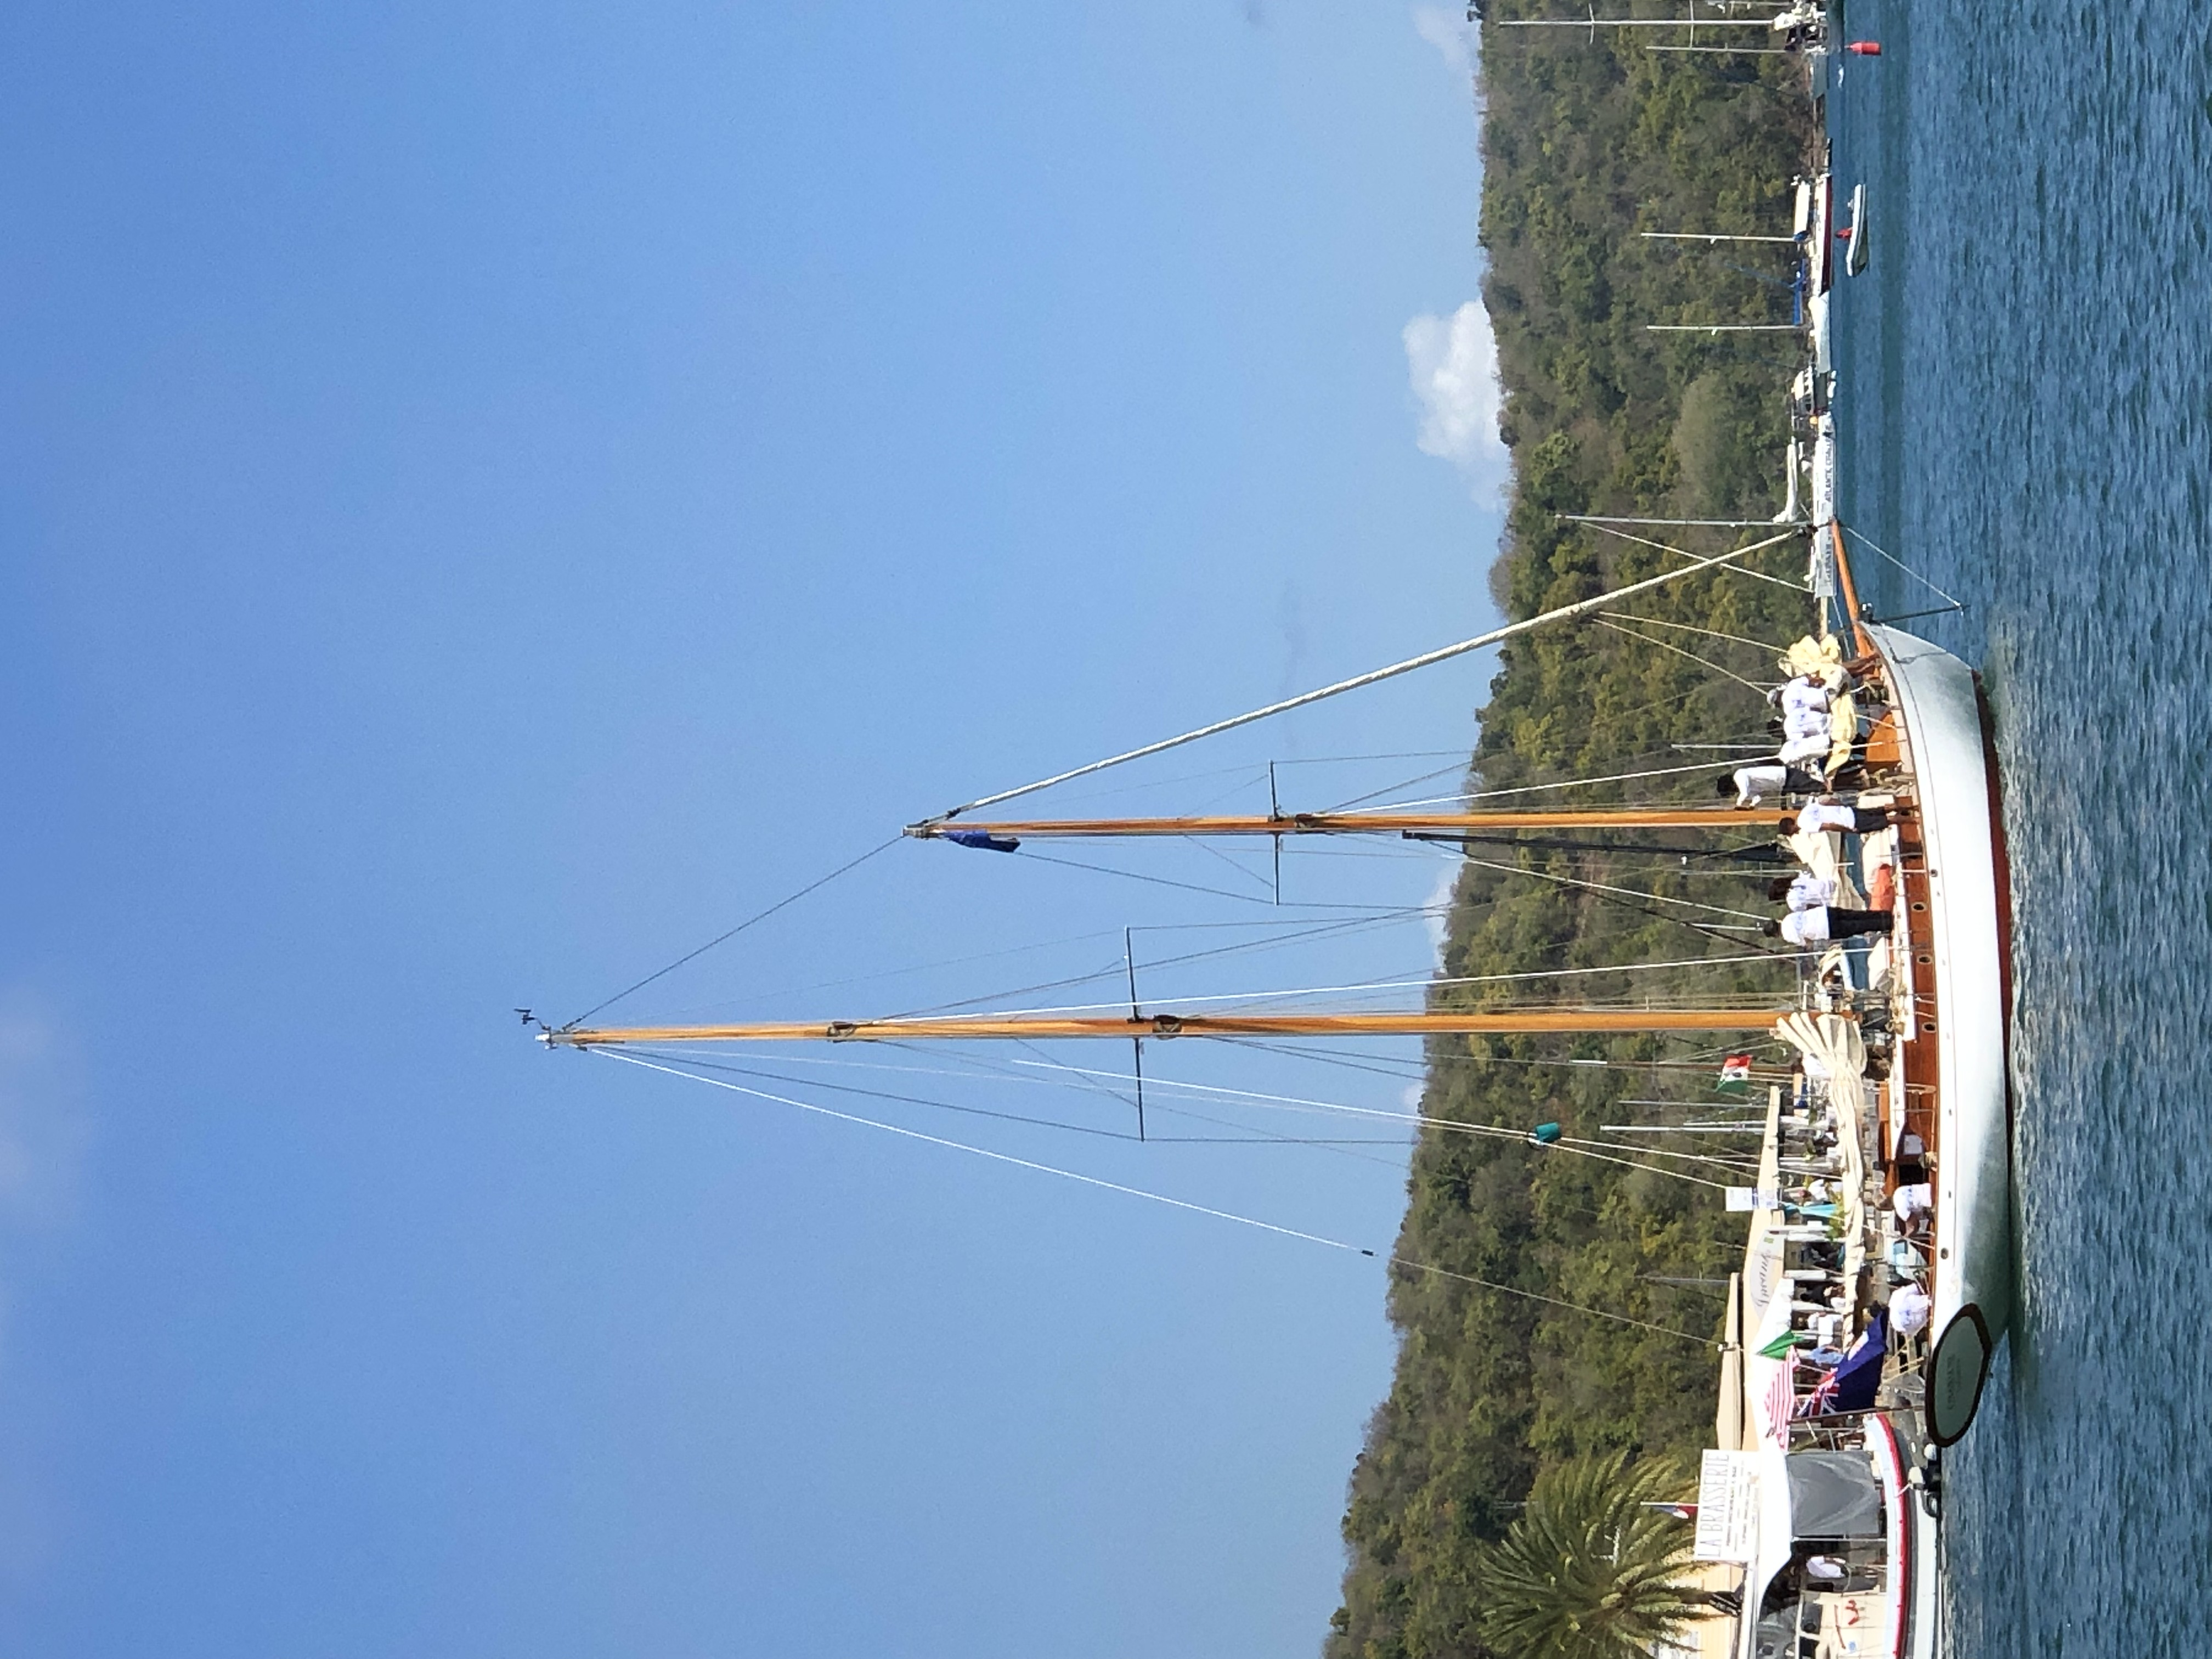 Charm III - Anguilla Staysail Schooner